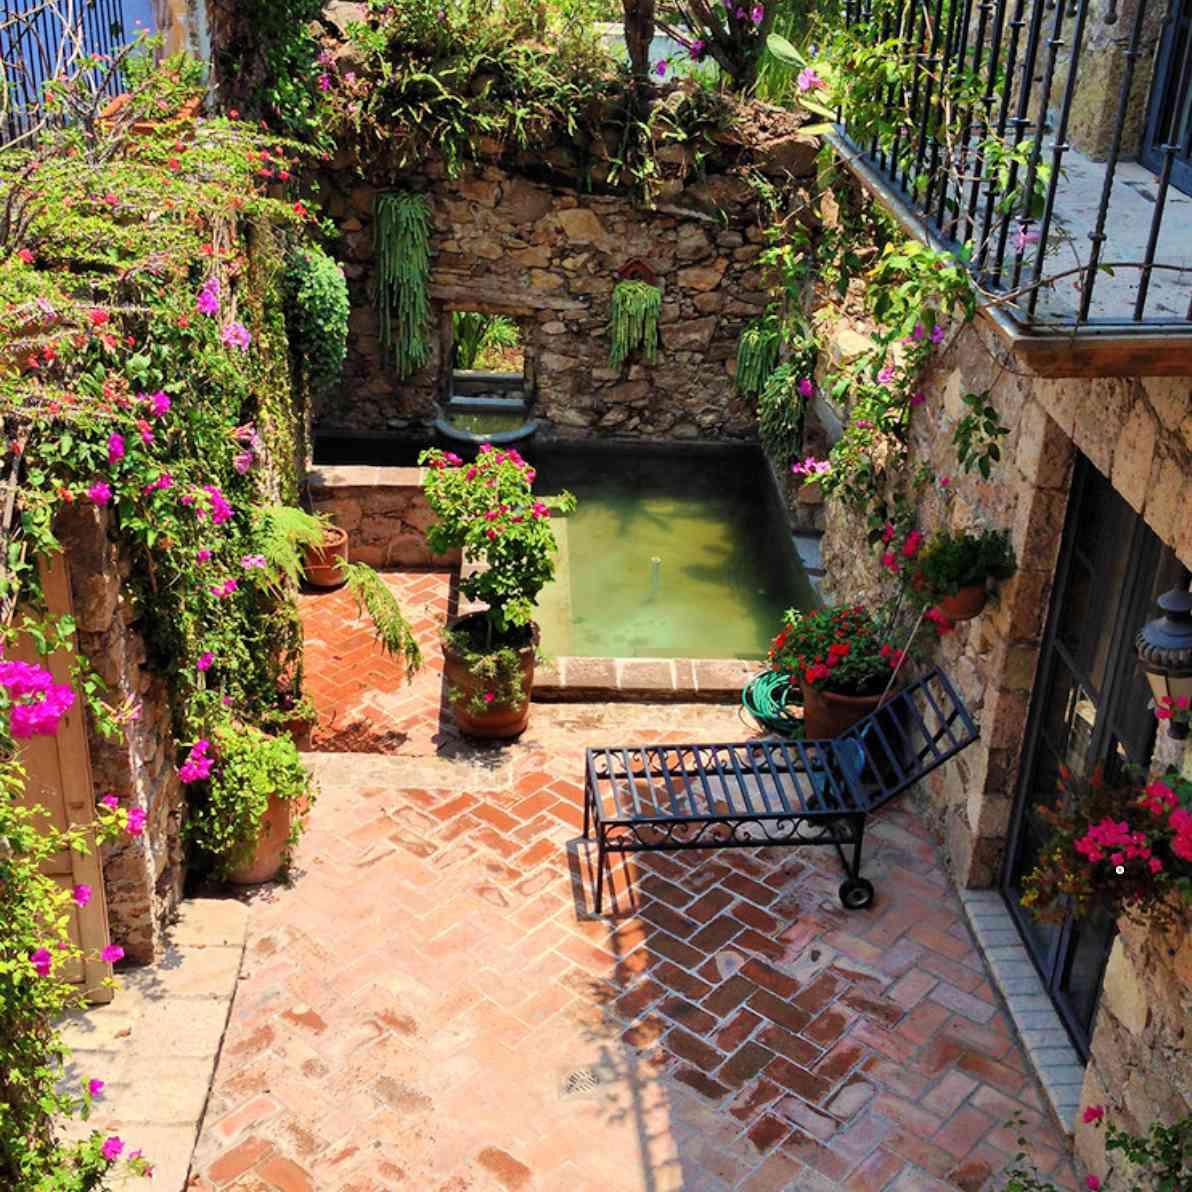 Walled gardens along brick walkway in Mexico